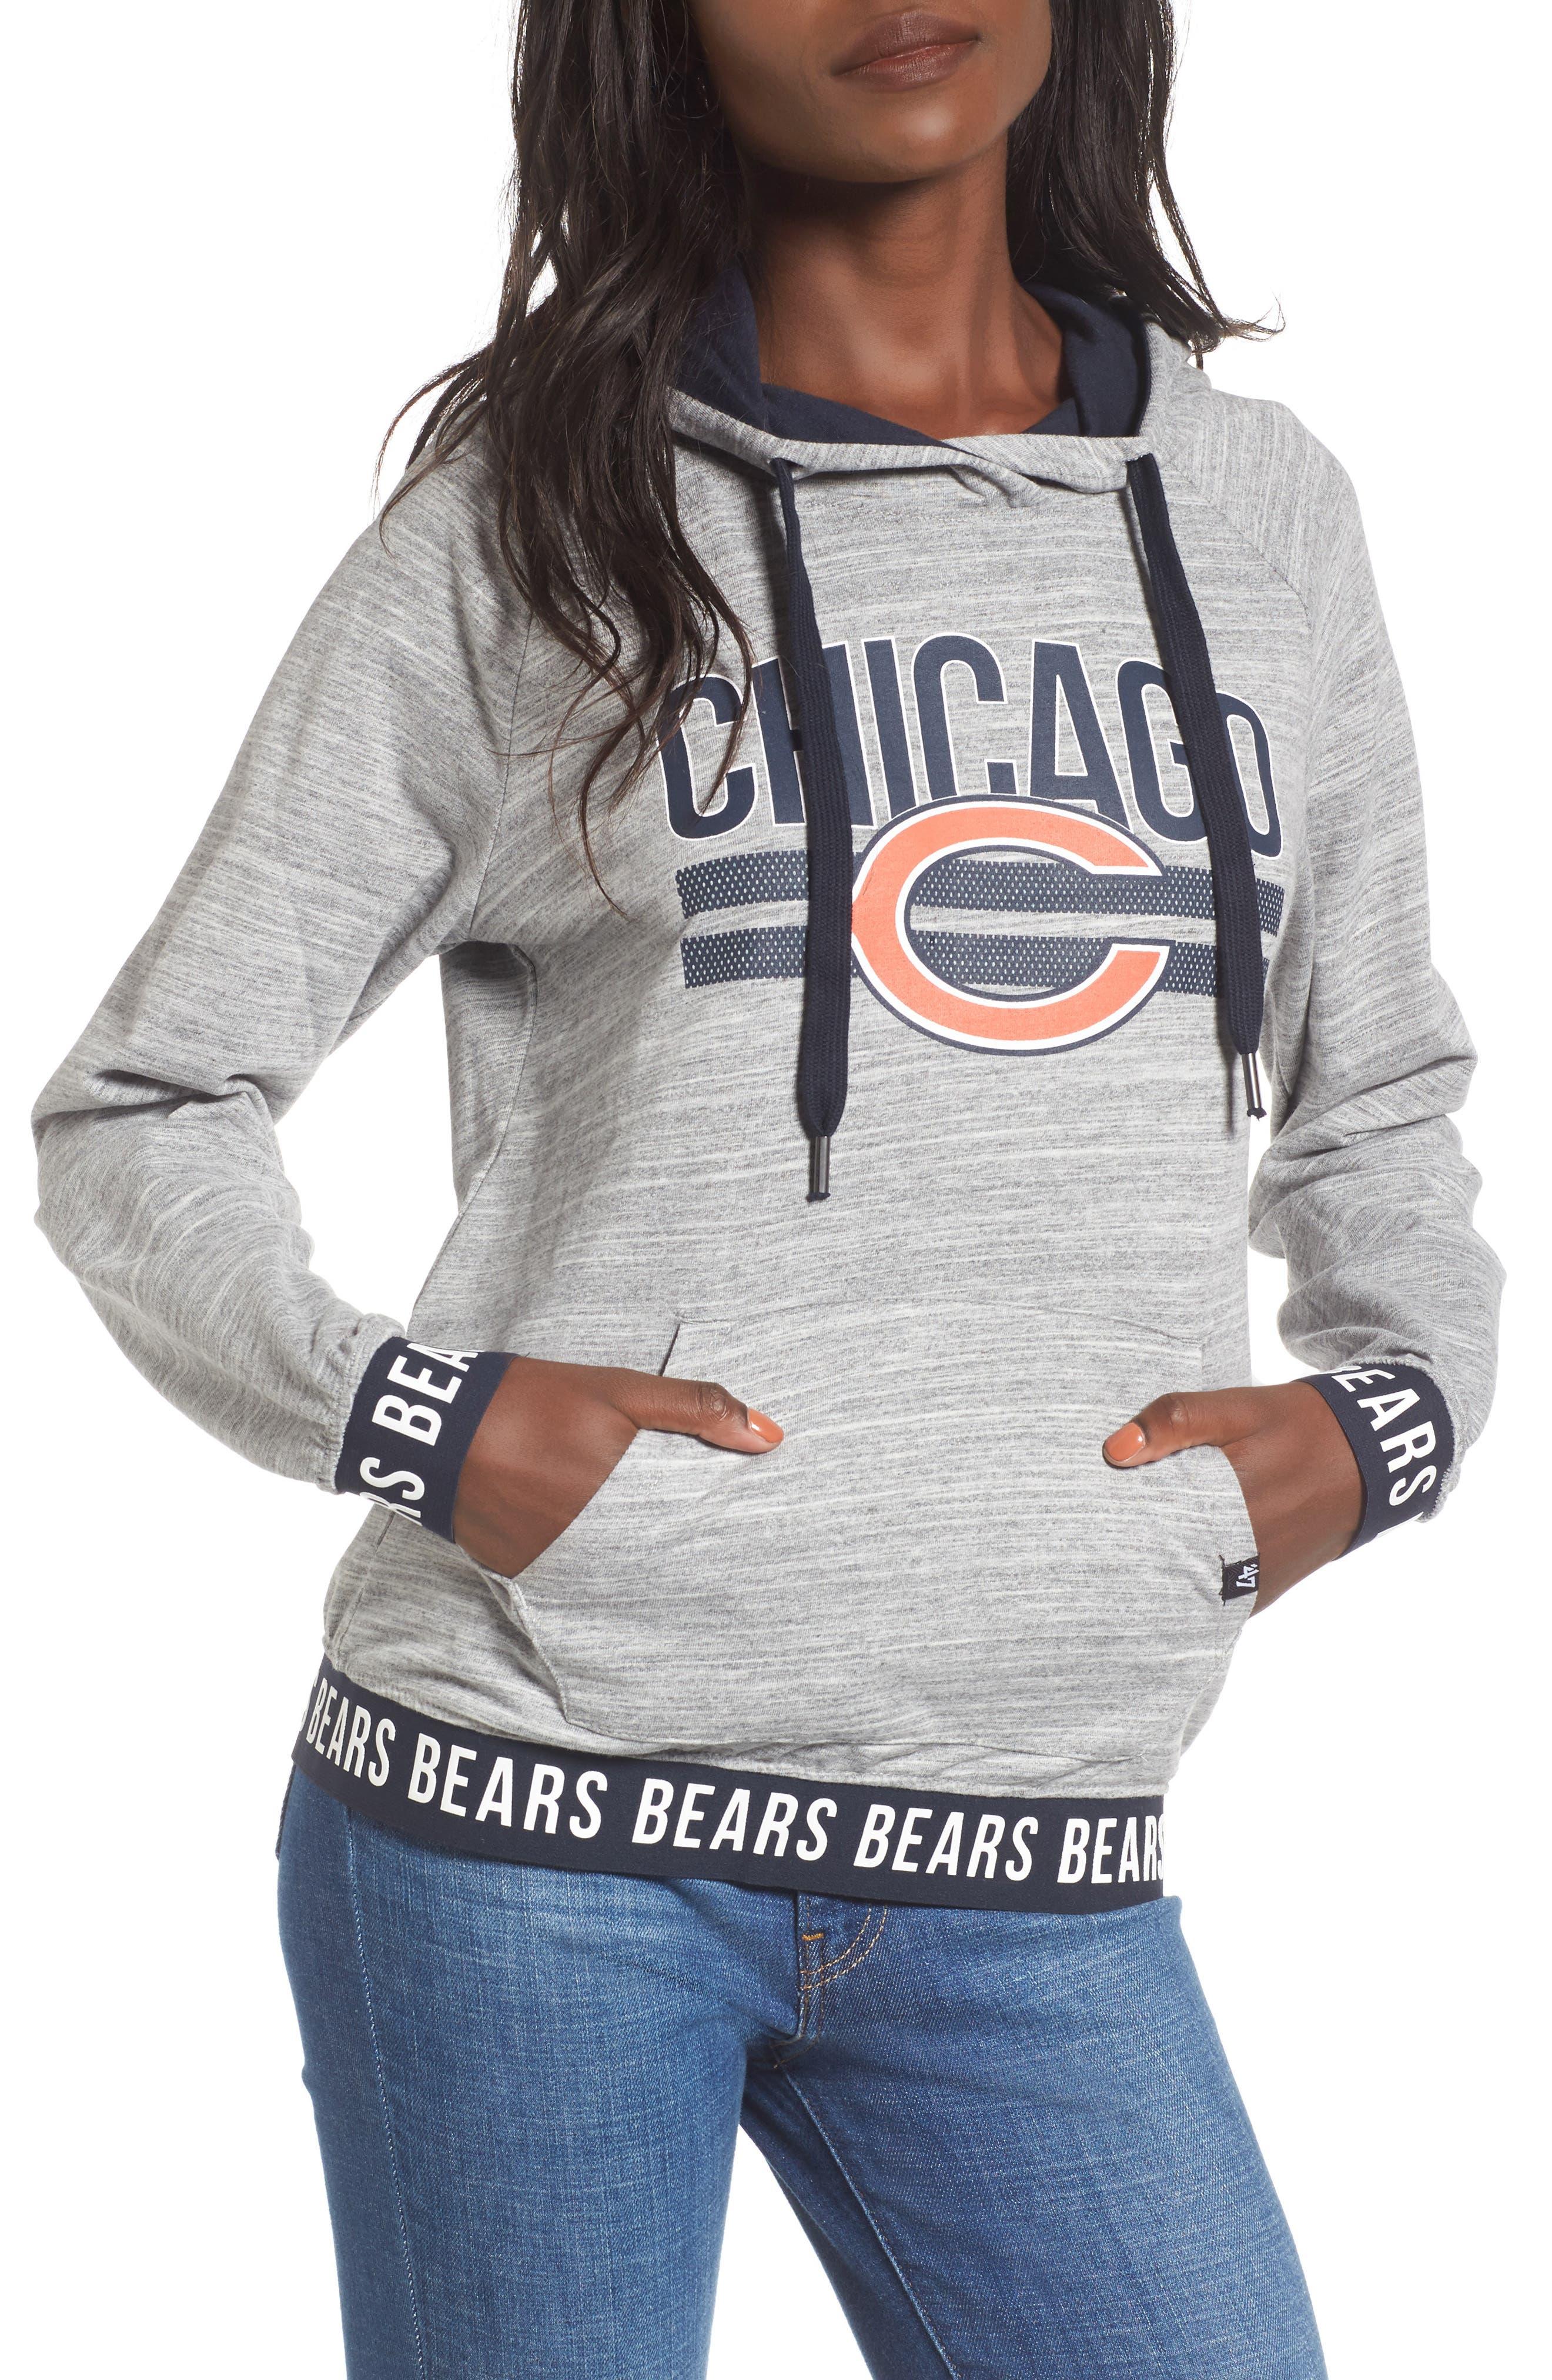 Main Image - '47 Revolve - Chicago Bears Hoodie